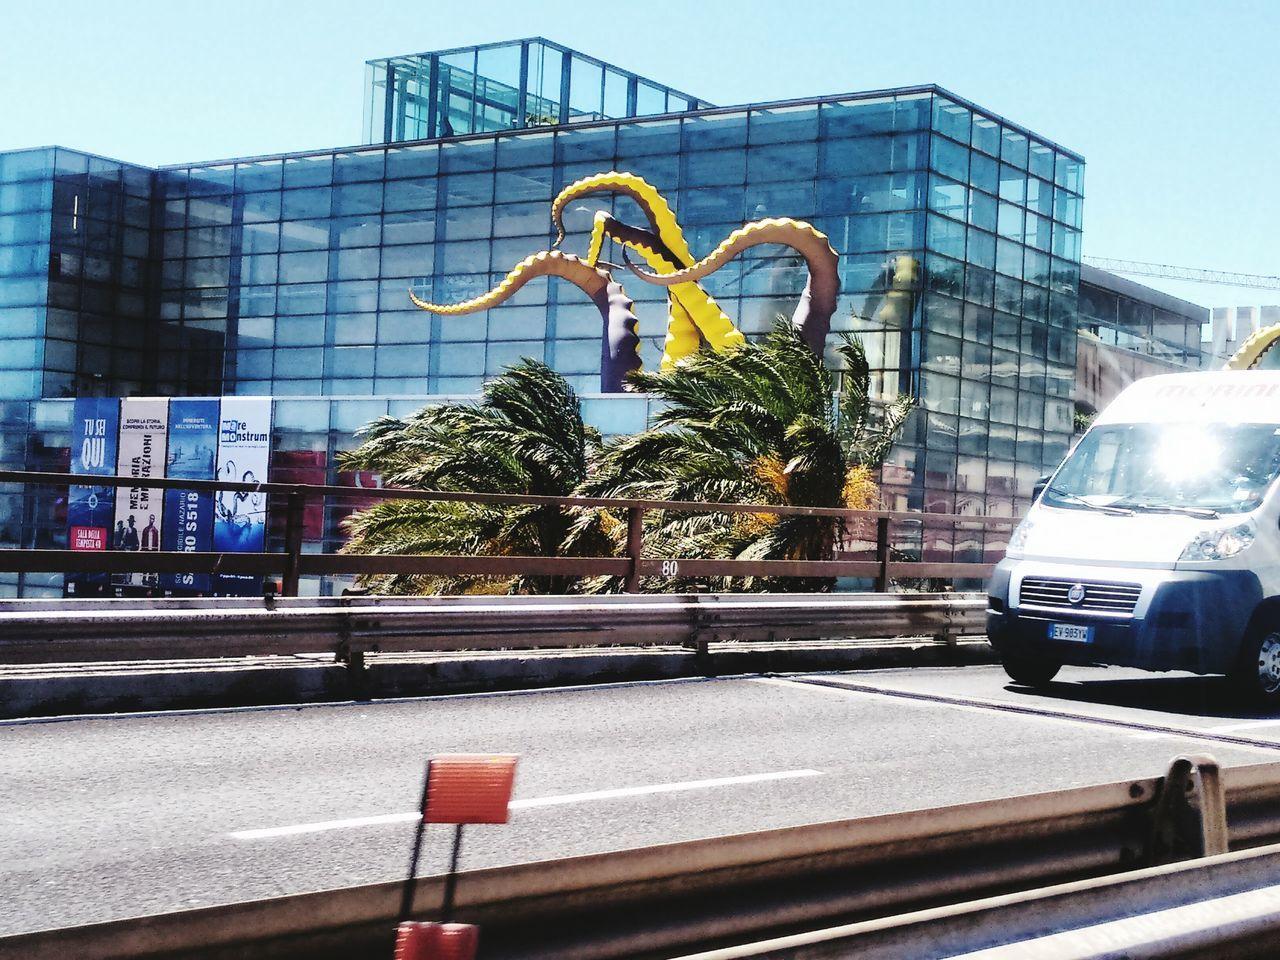 Sopraelevata Road Octopus Piovra Galata Museo Del Mare